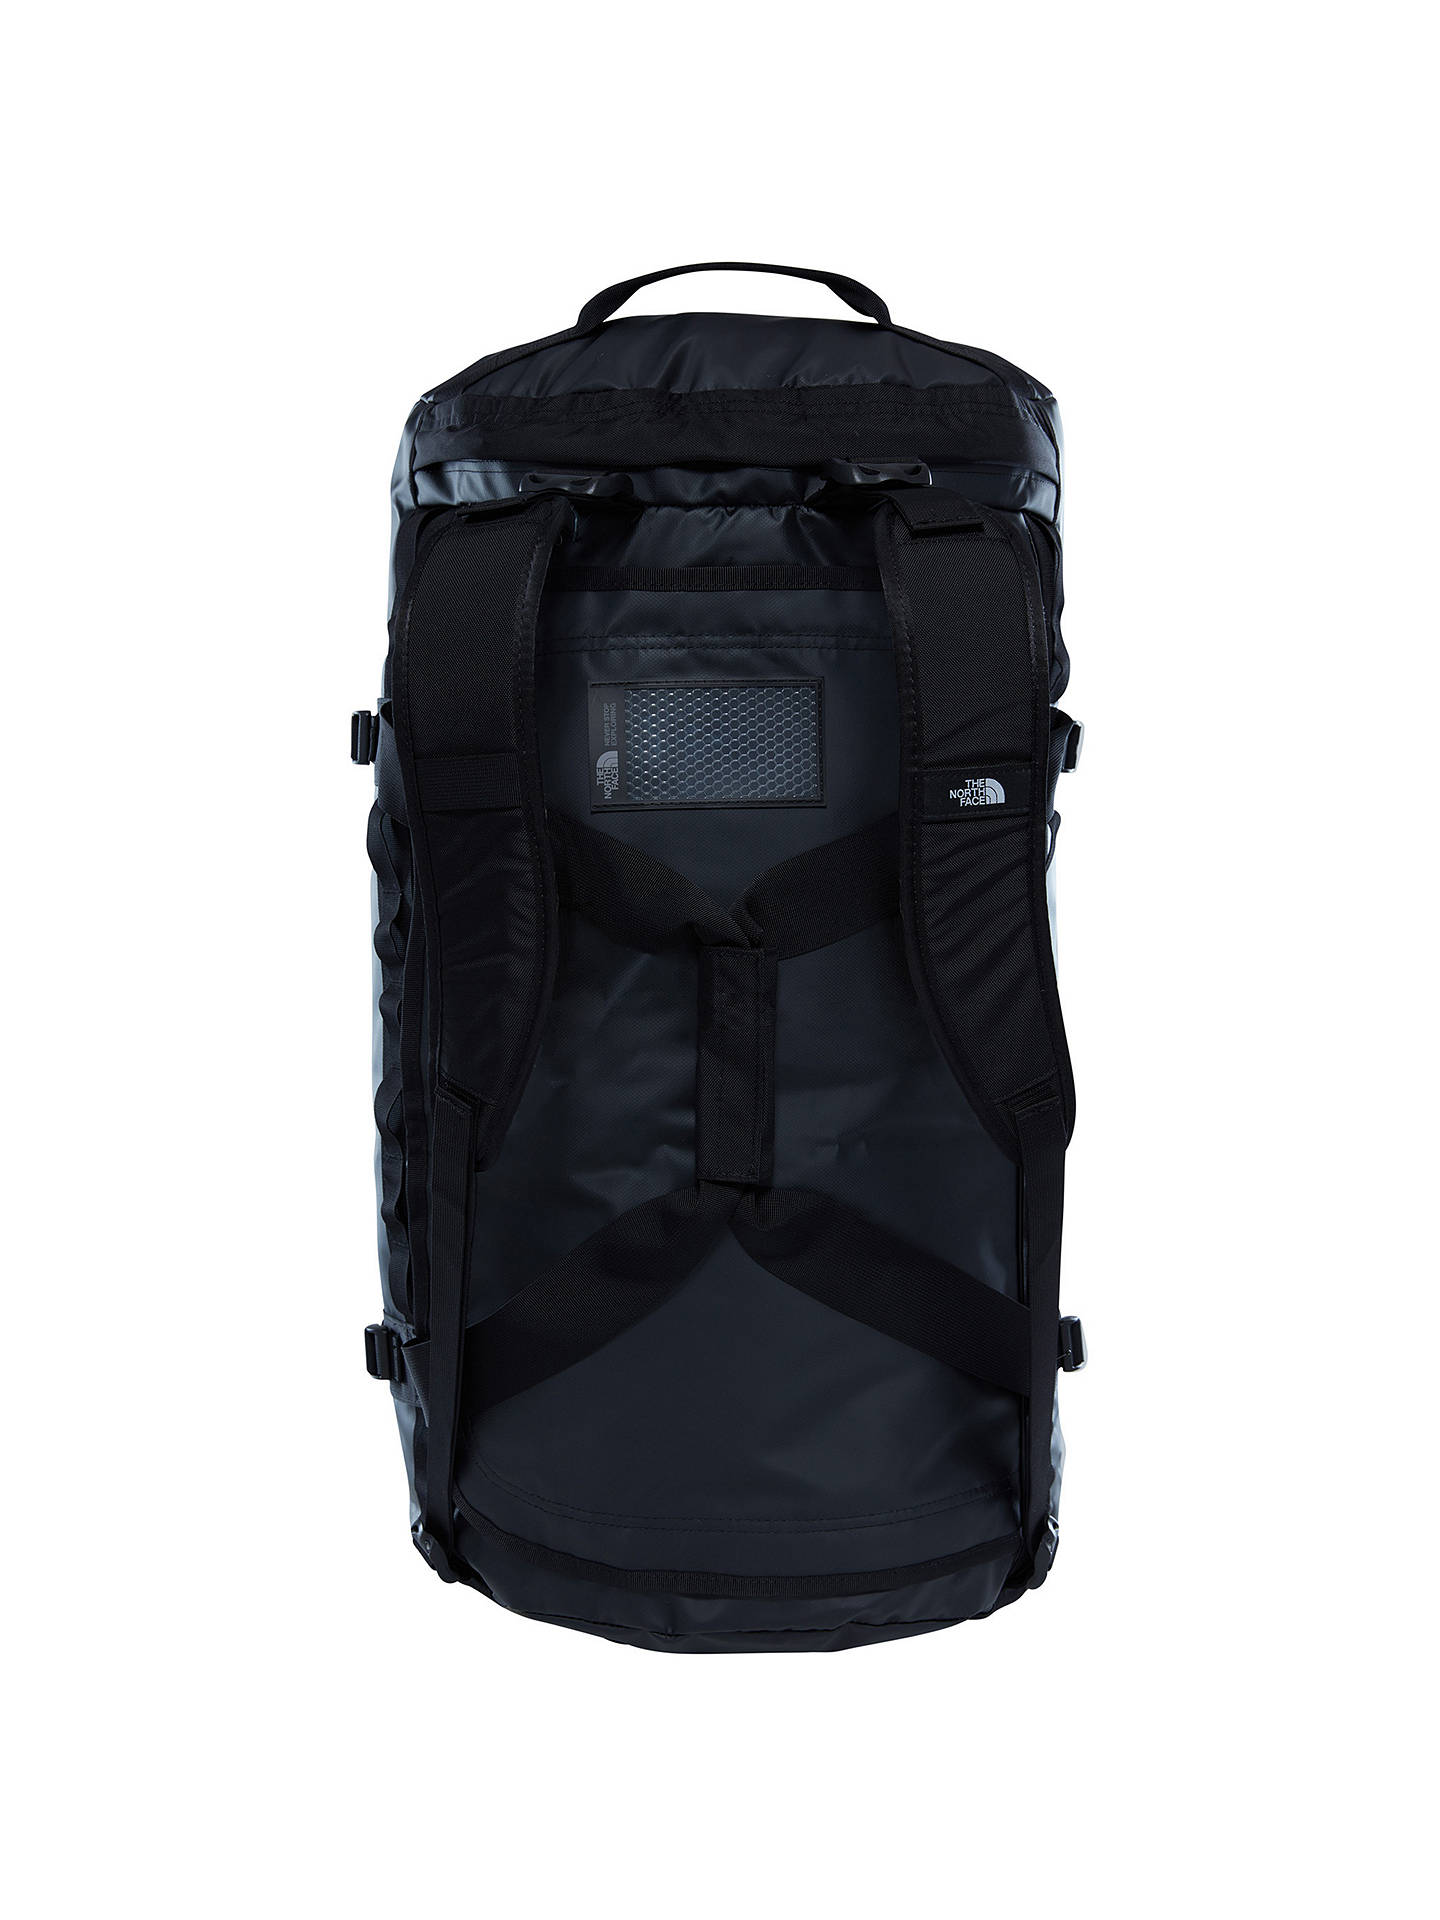 e26a7d7b5 The North Face Base Camp Duffle Bag, Large, Black